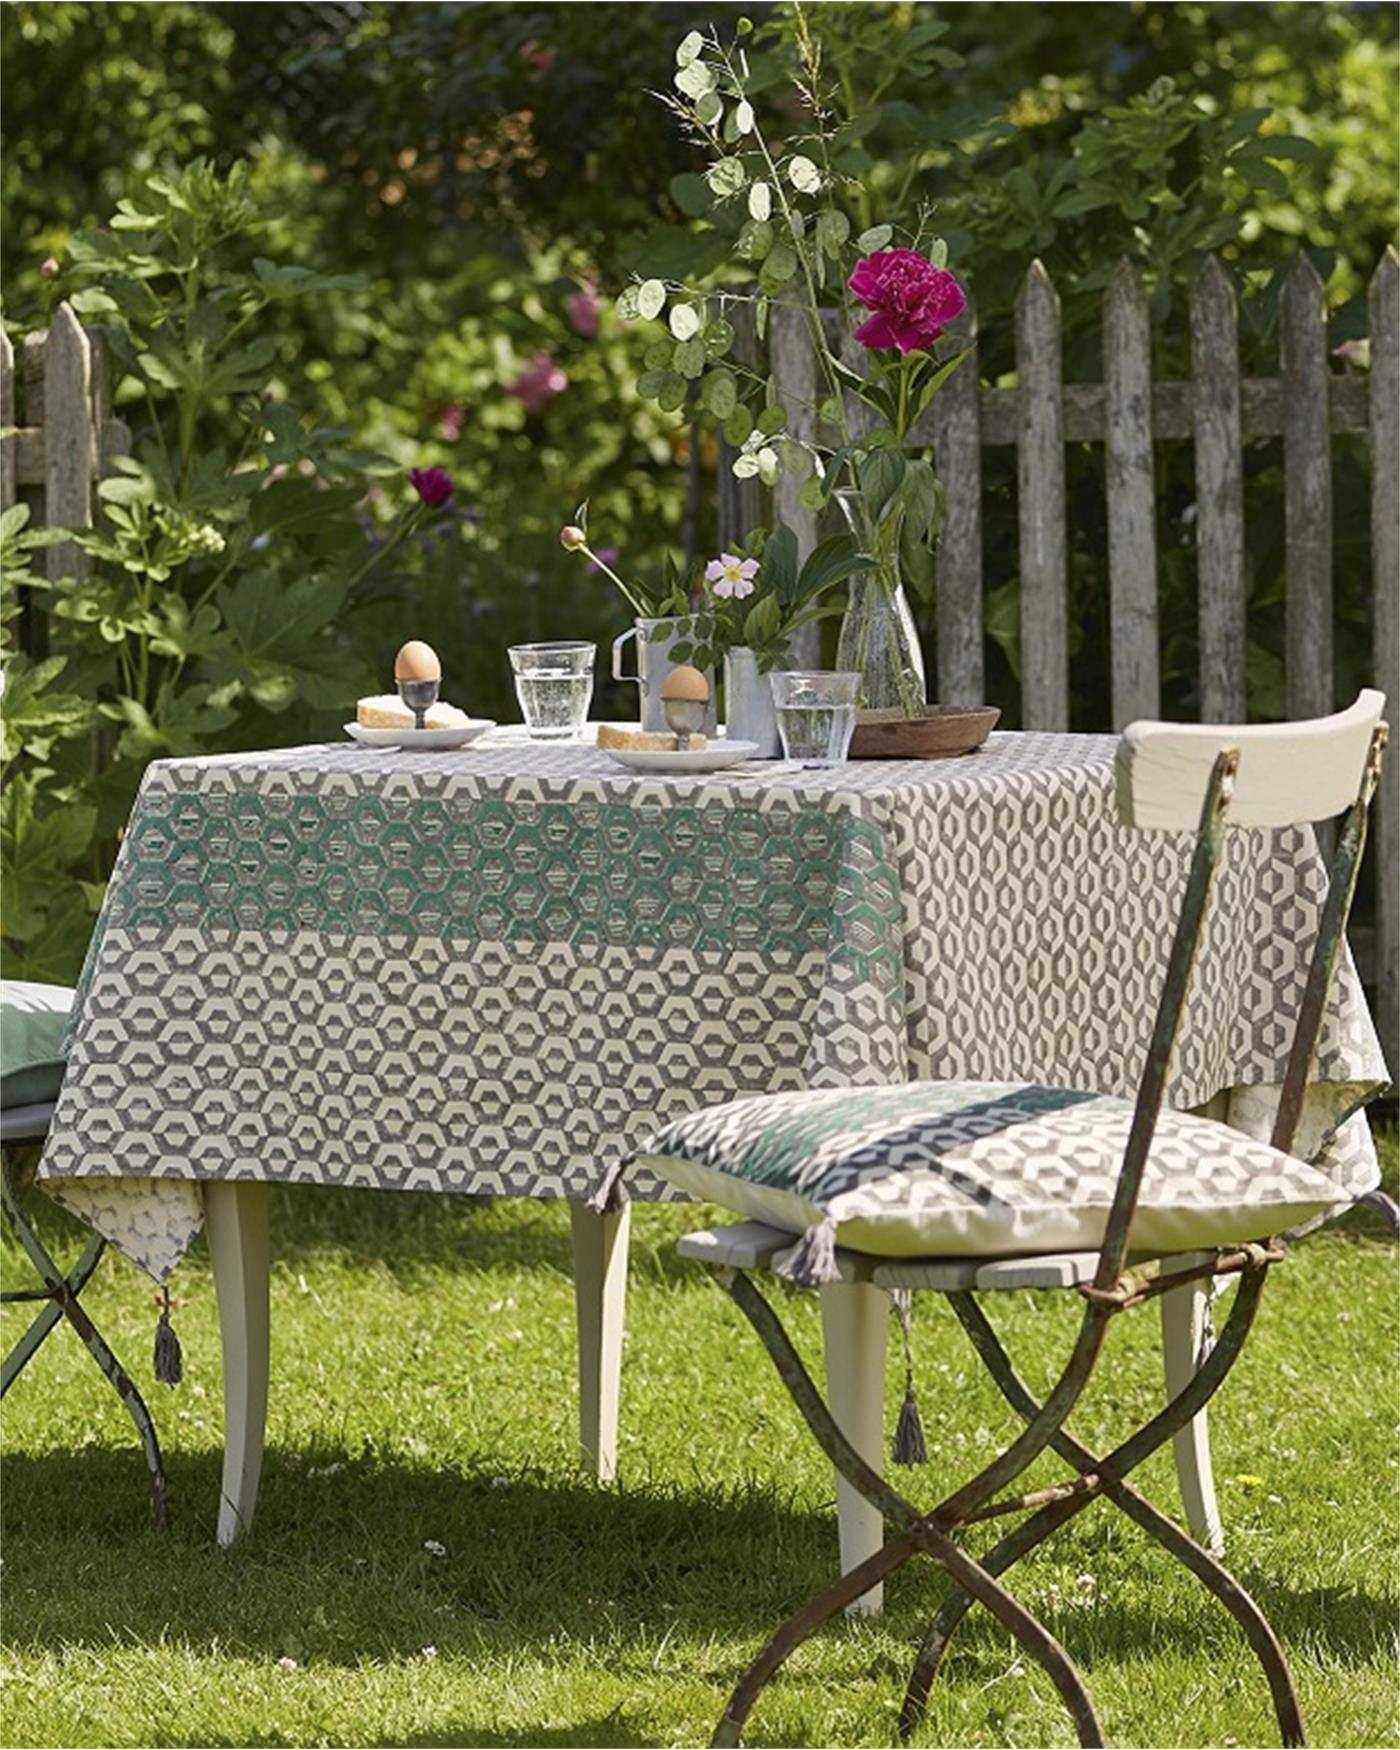 tischdecke gr n grau. Black Bedroom Furniture Sets. Home Design Ideas